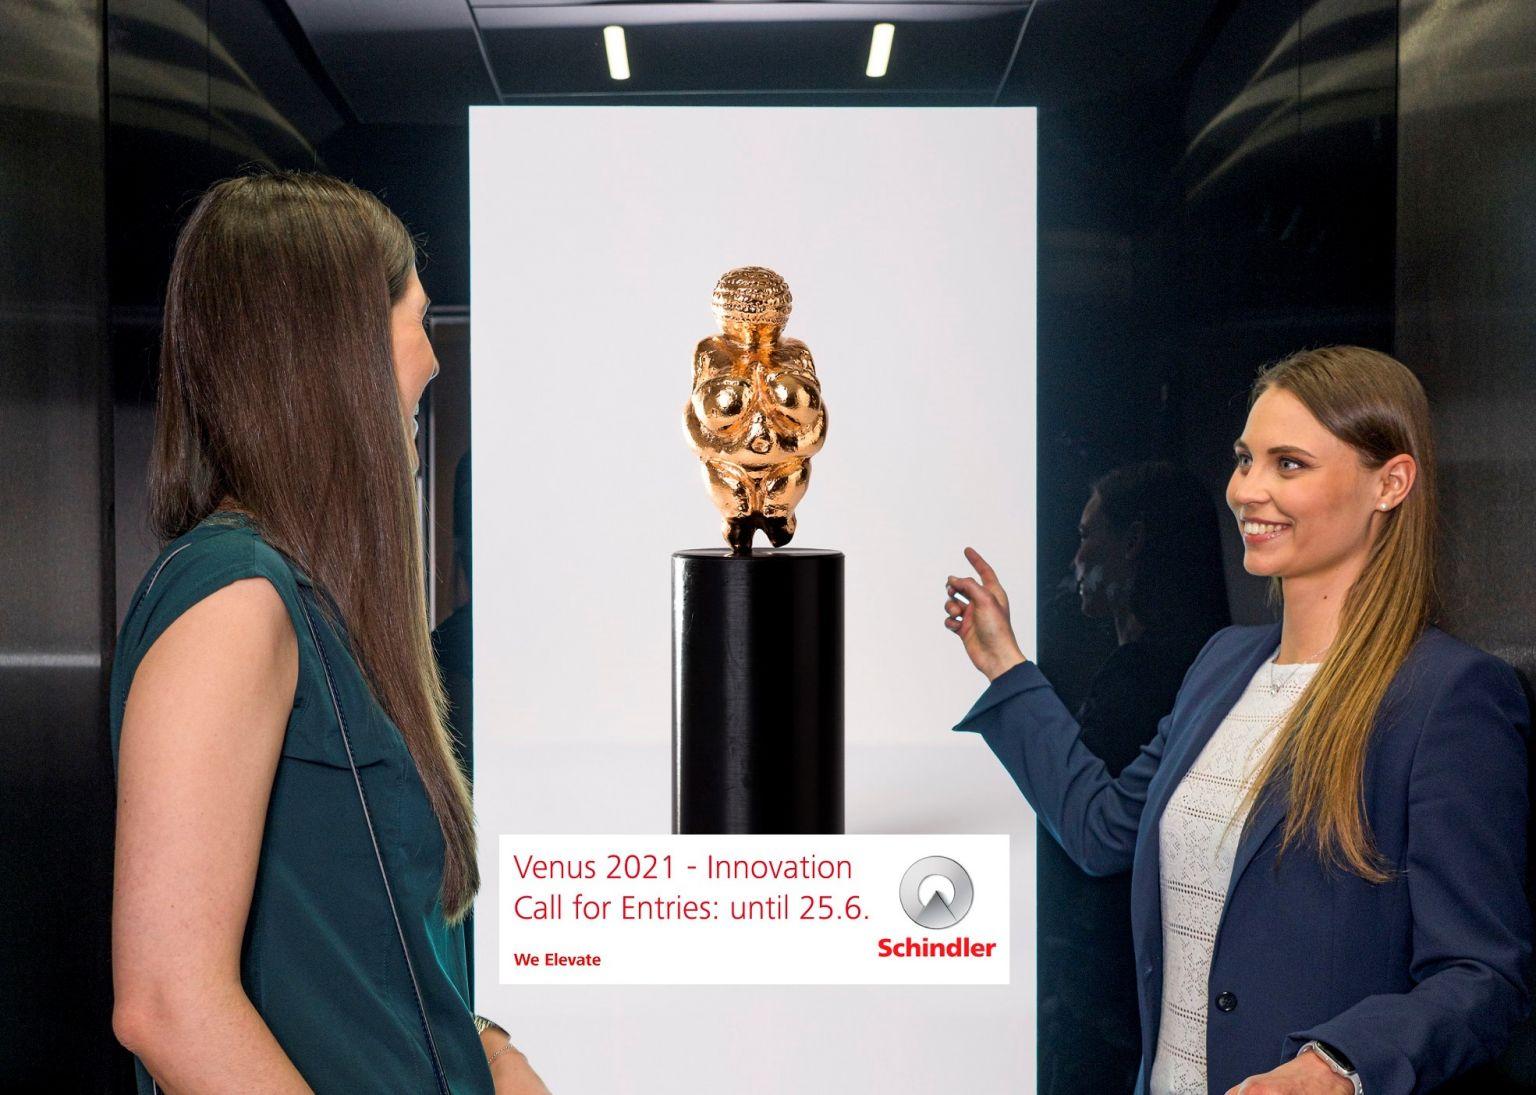 Schindler sponsort CCA-Venus 2021